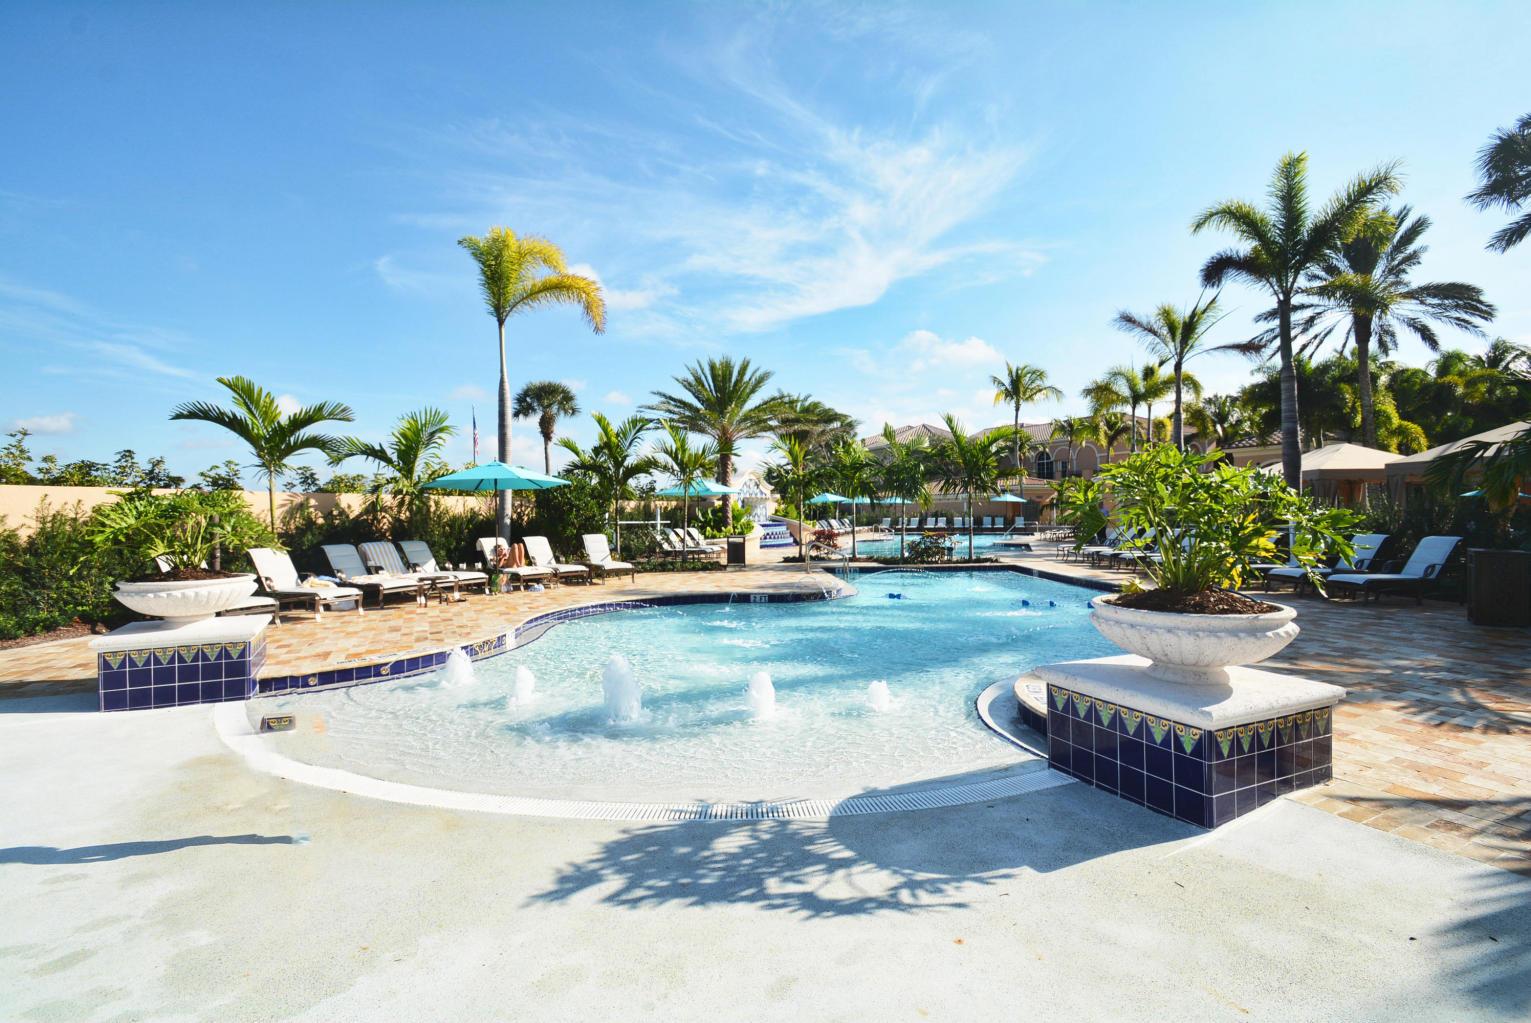 MIRASOL PALM BEACH GARDENS FLORIDA